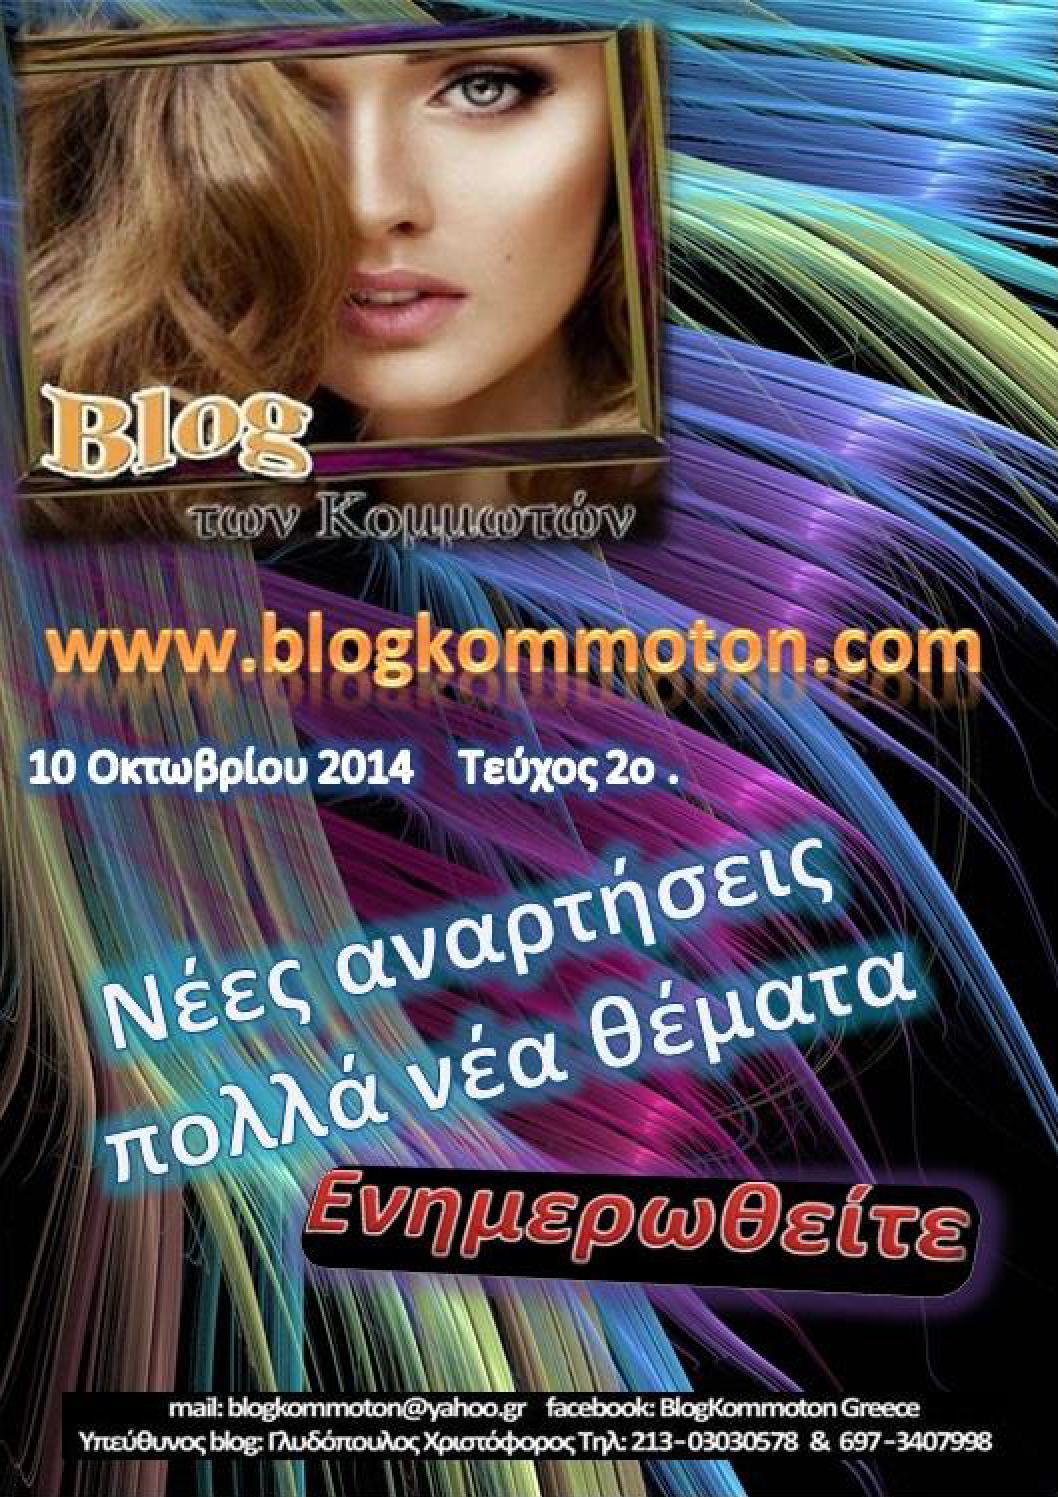 10 10 2014 blogkommoton by www.blogkommoton.com - issuu e751cf425d6